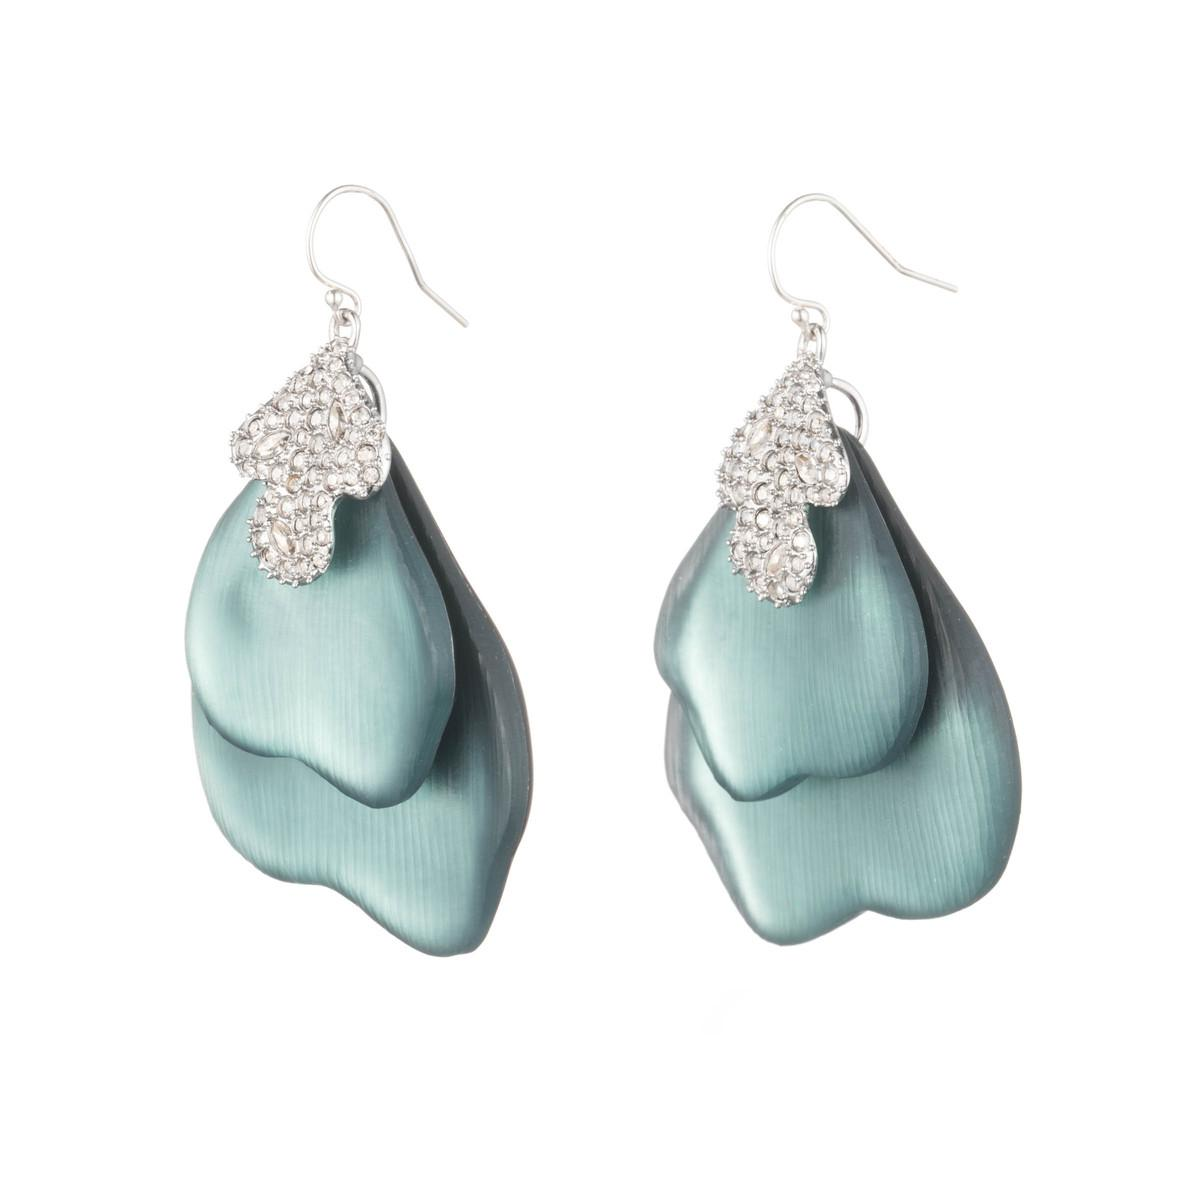 Alexis Bittar Crystal Encrusted Abstract Earring Teal blue xYta9HN